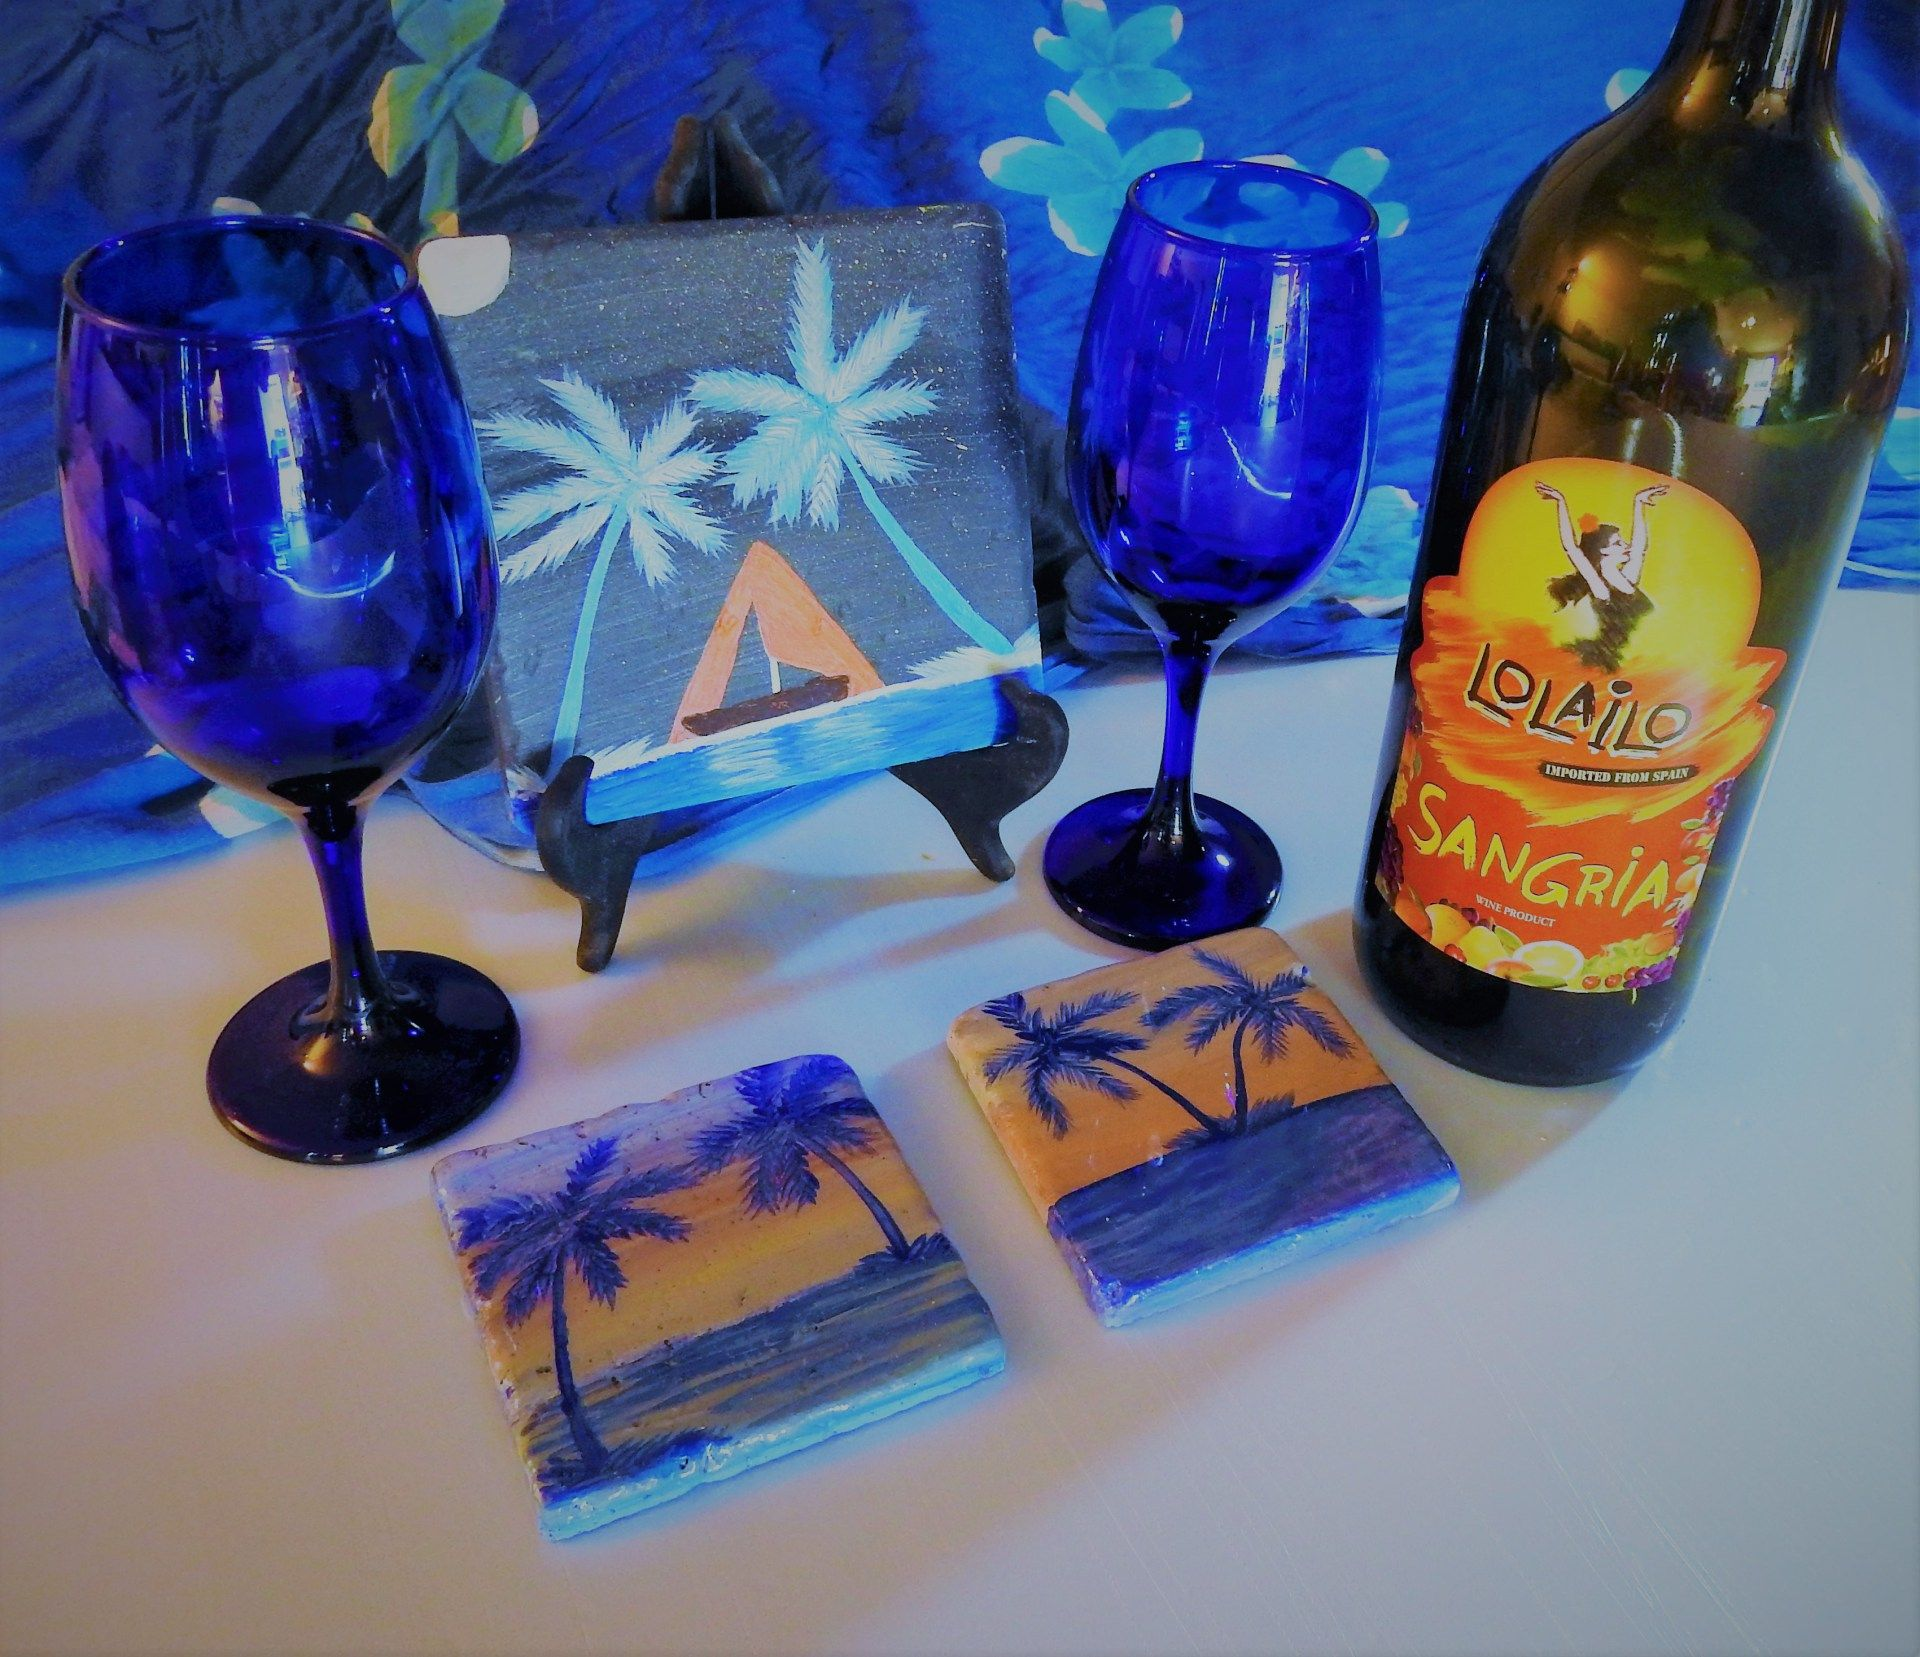 visit the Soul Kitchen Internet Cafe | Coastal Soul Art Gallery and ...